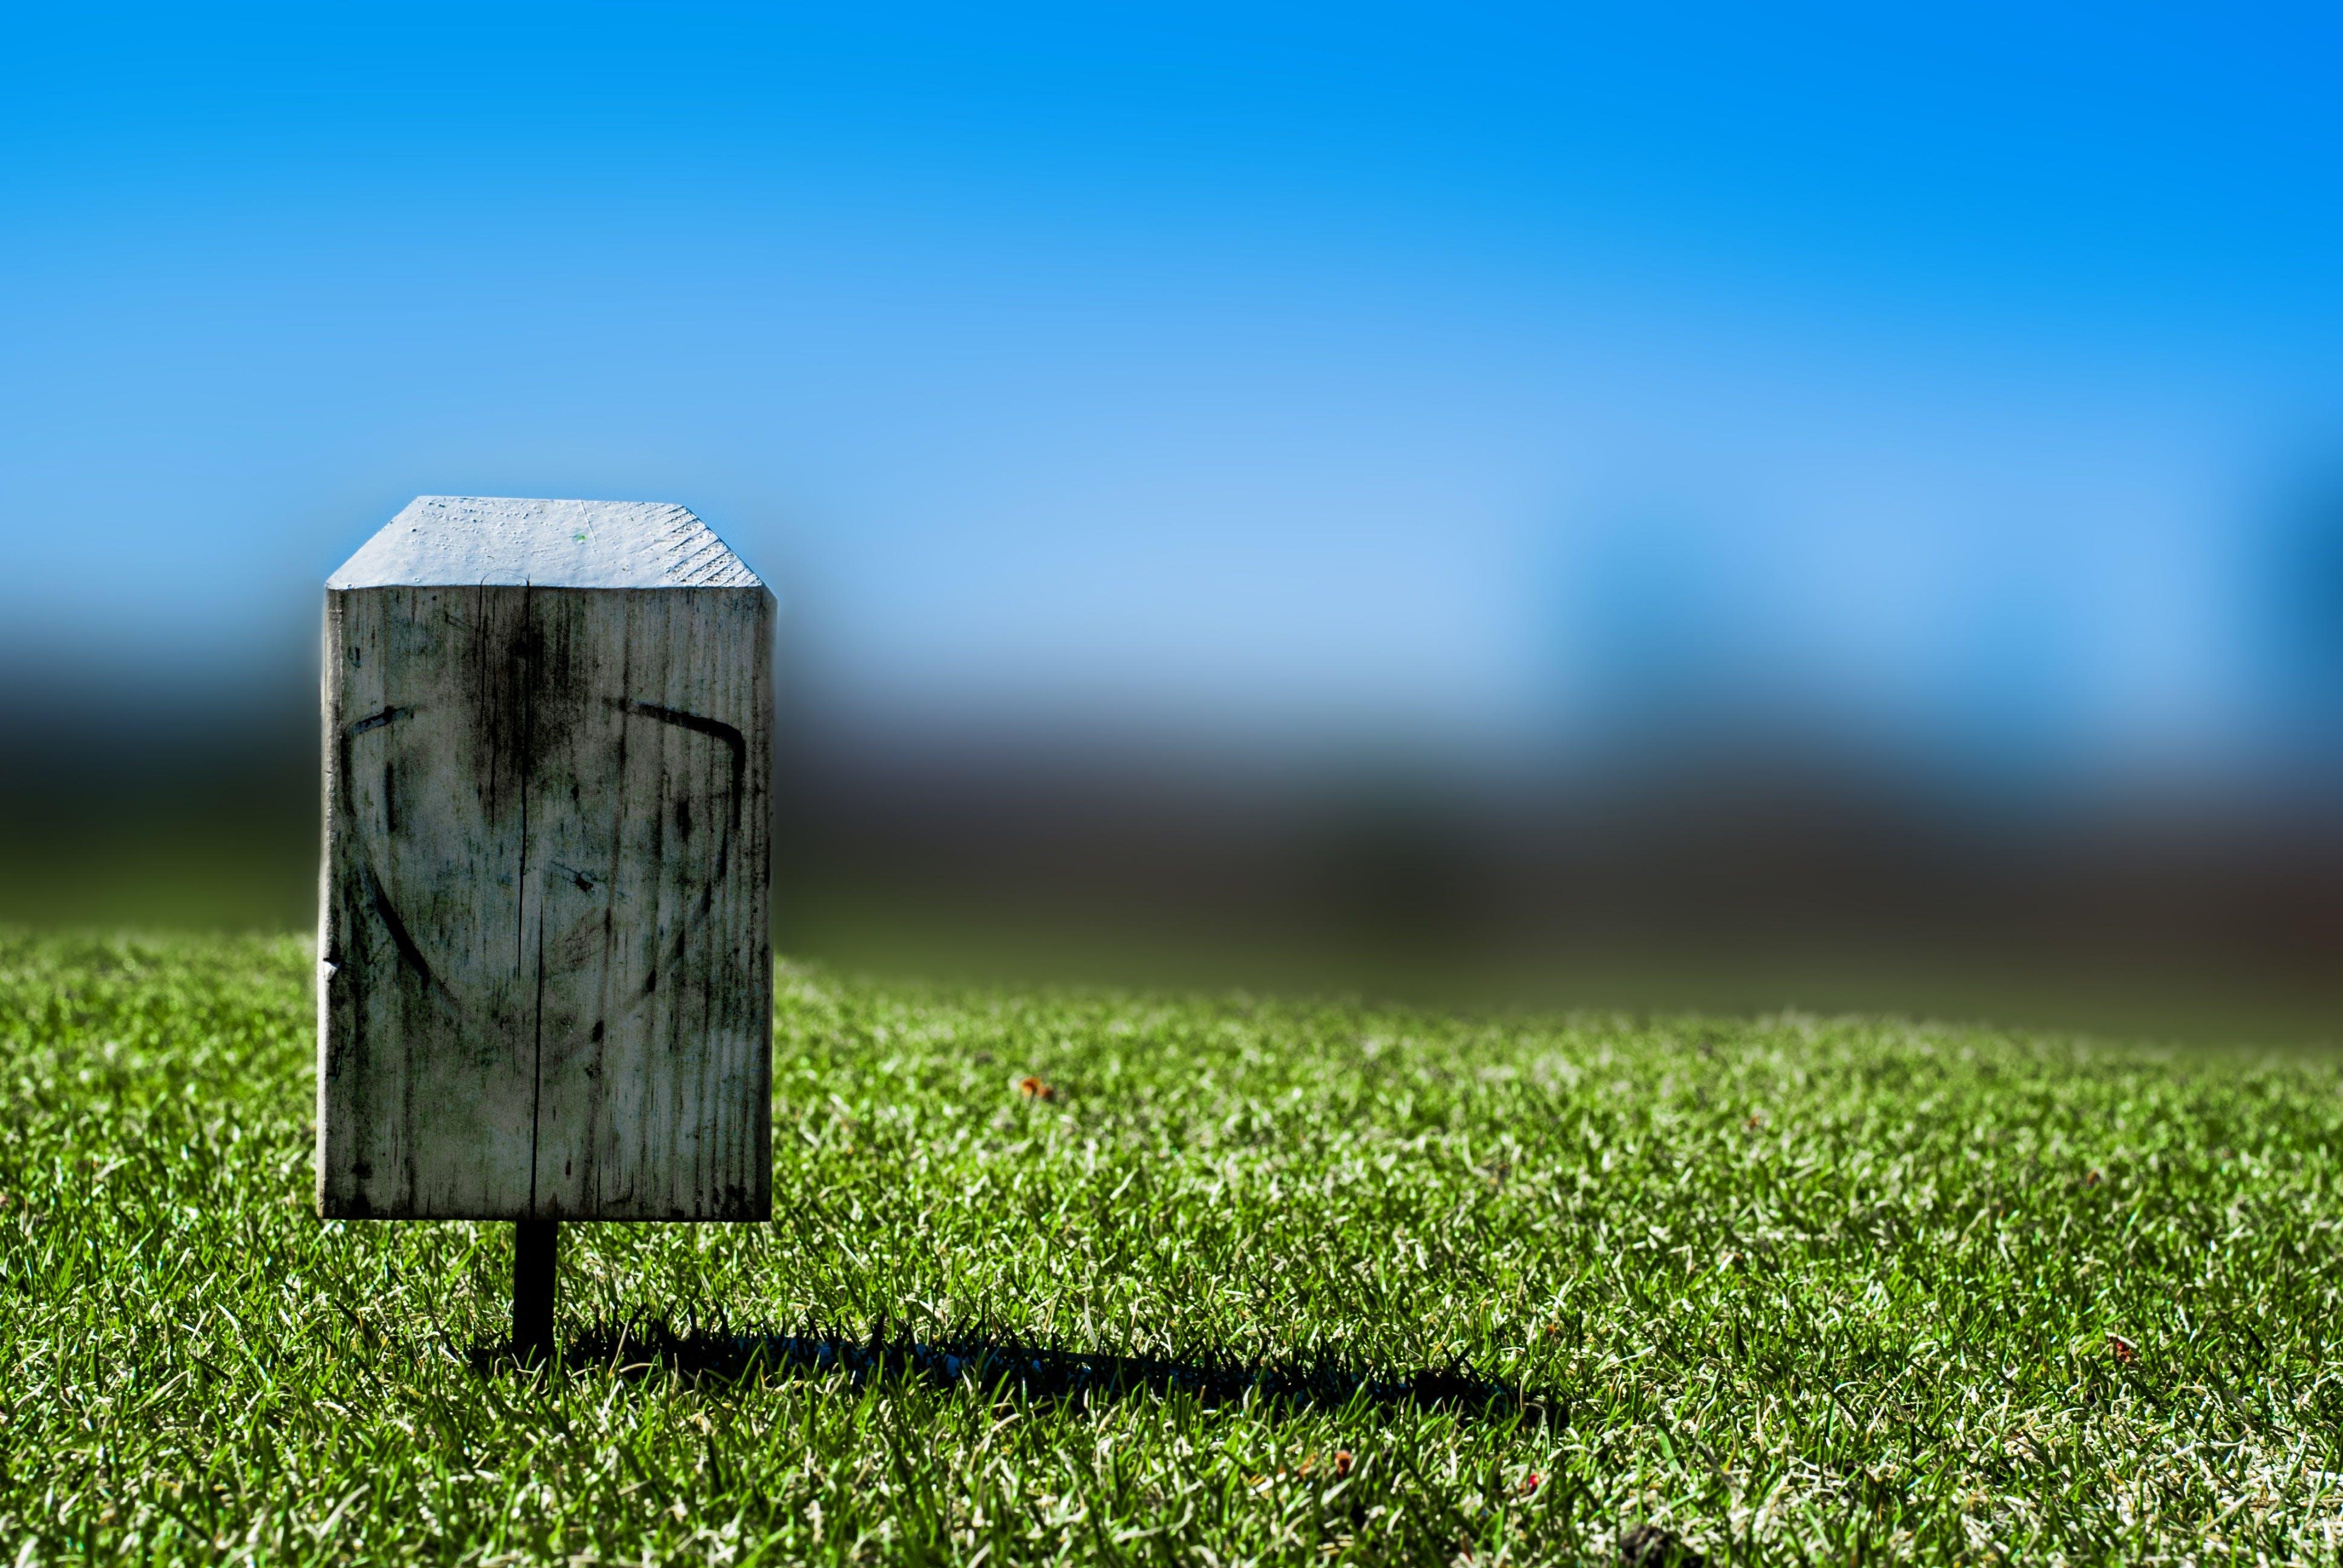 Free stock photo of grass, club, lifestyle, golf